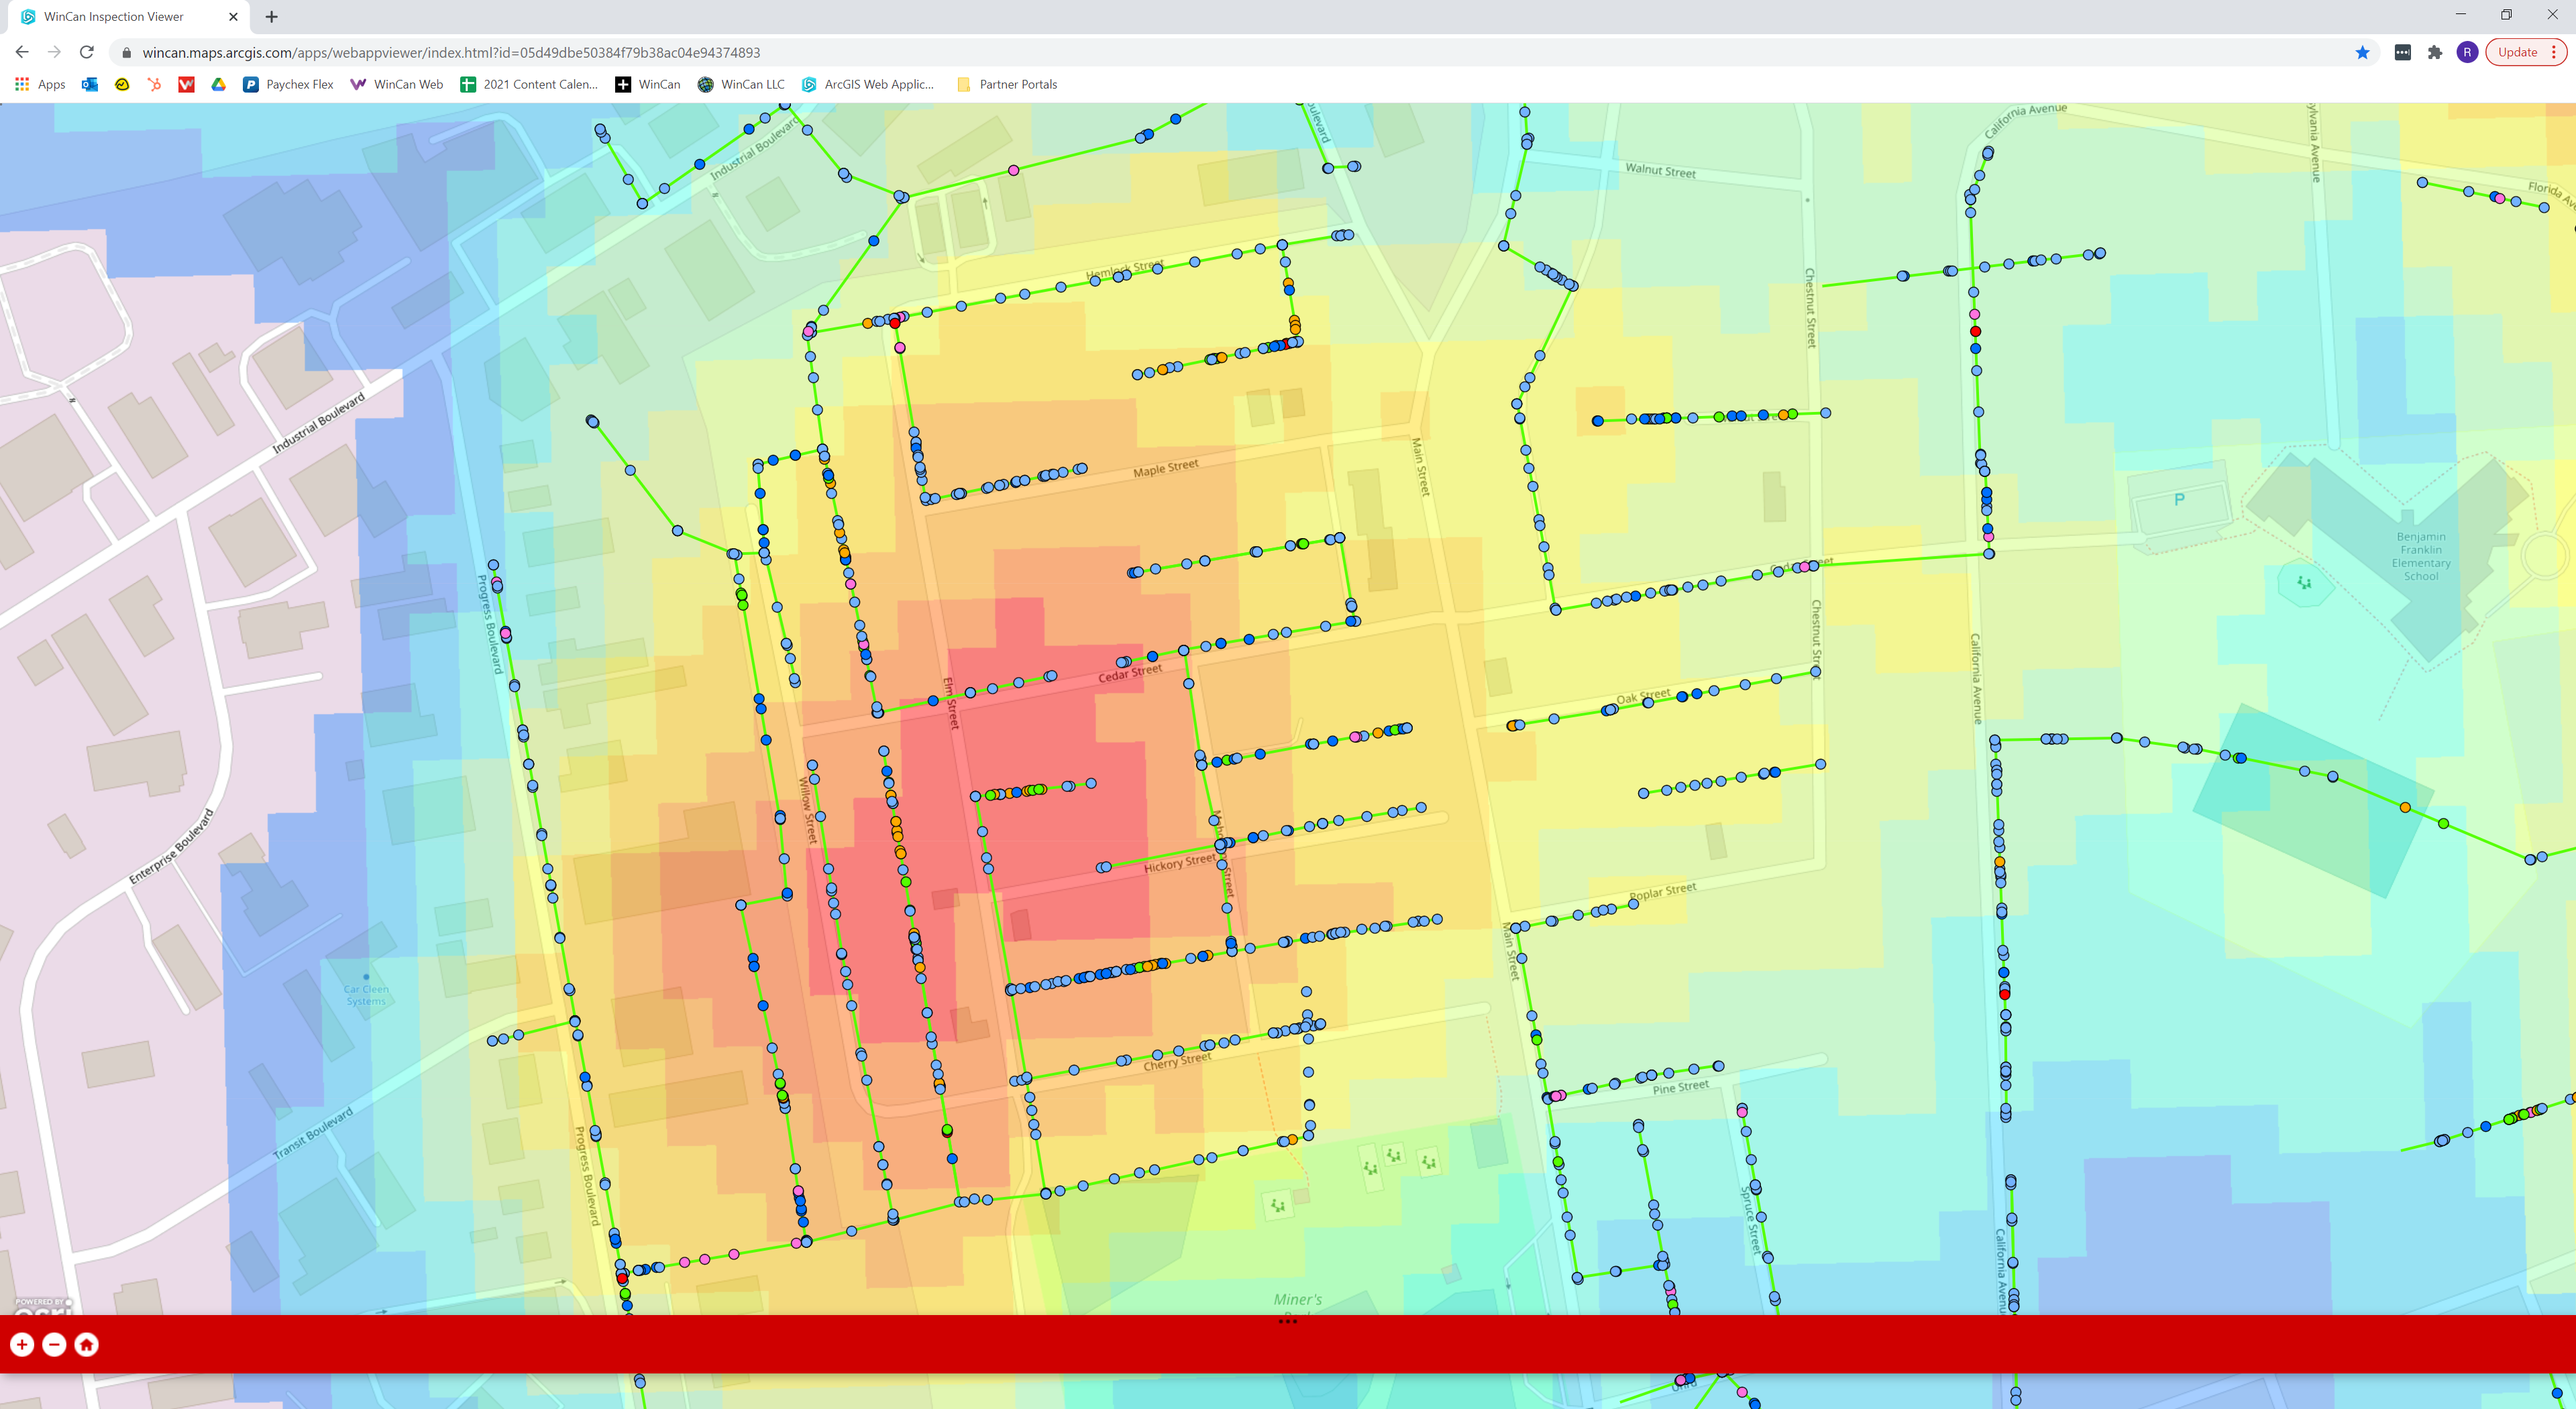 Sewer Data Analysis